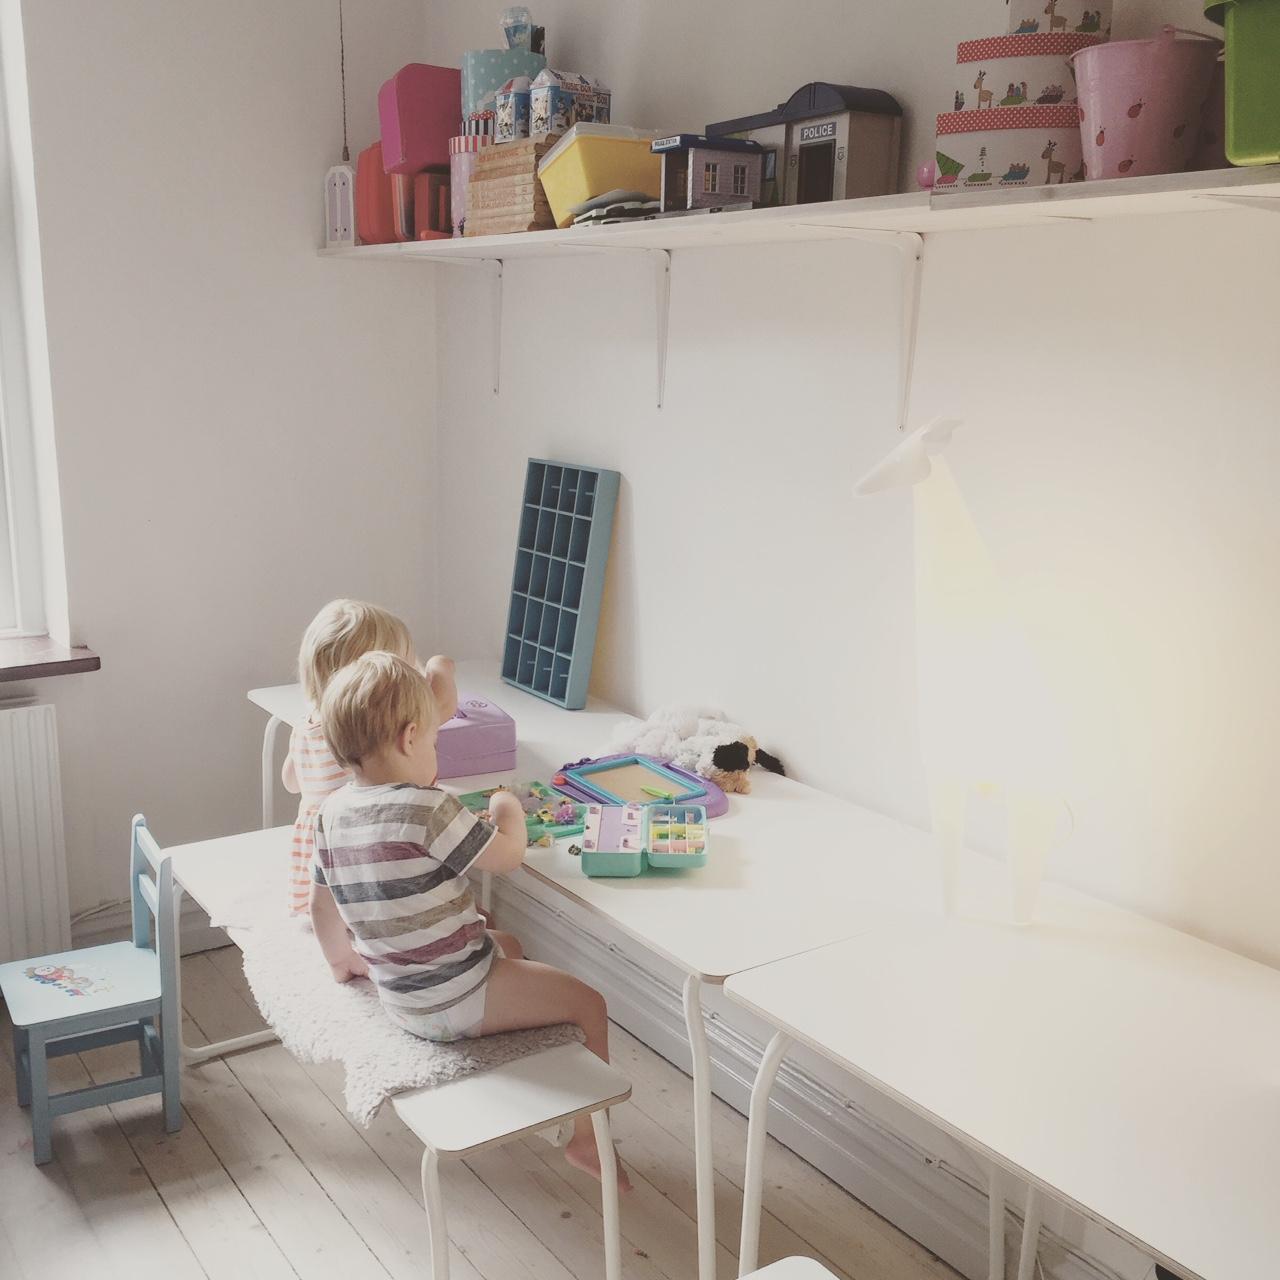 Ikea Skrivbord Barn Ikea Skrivbord Barn With Ikea Skrivbord Barn Elegant Ikea Skrivbord Barn